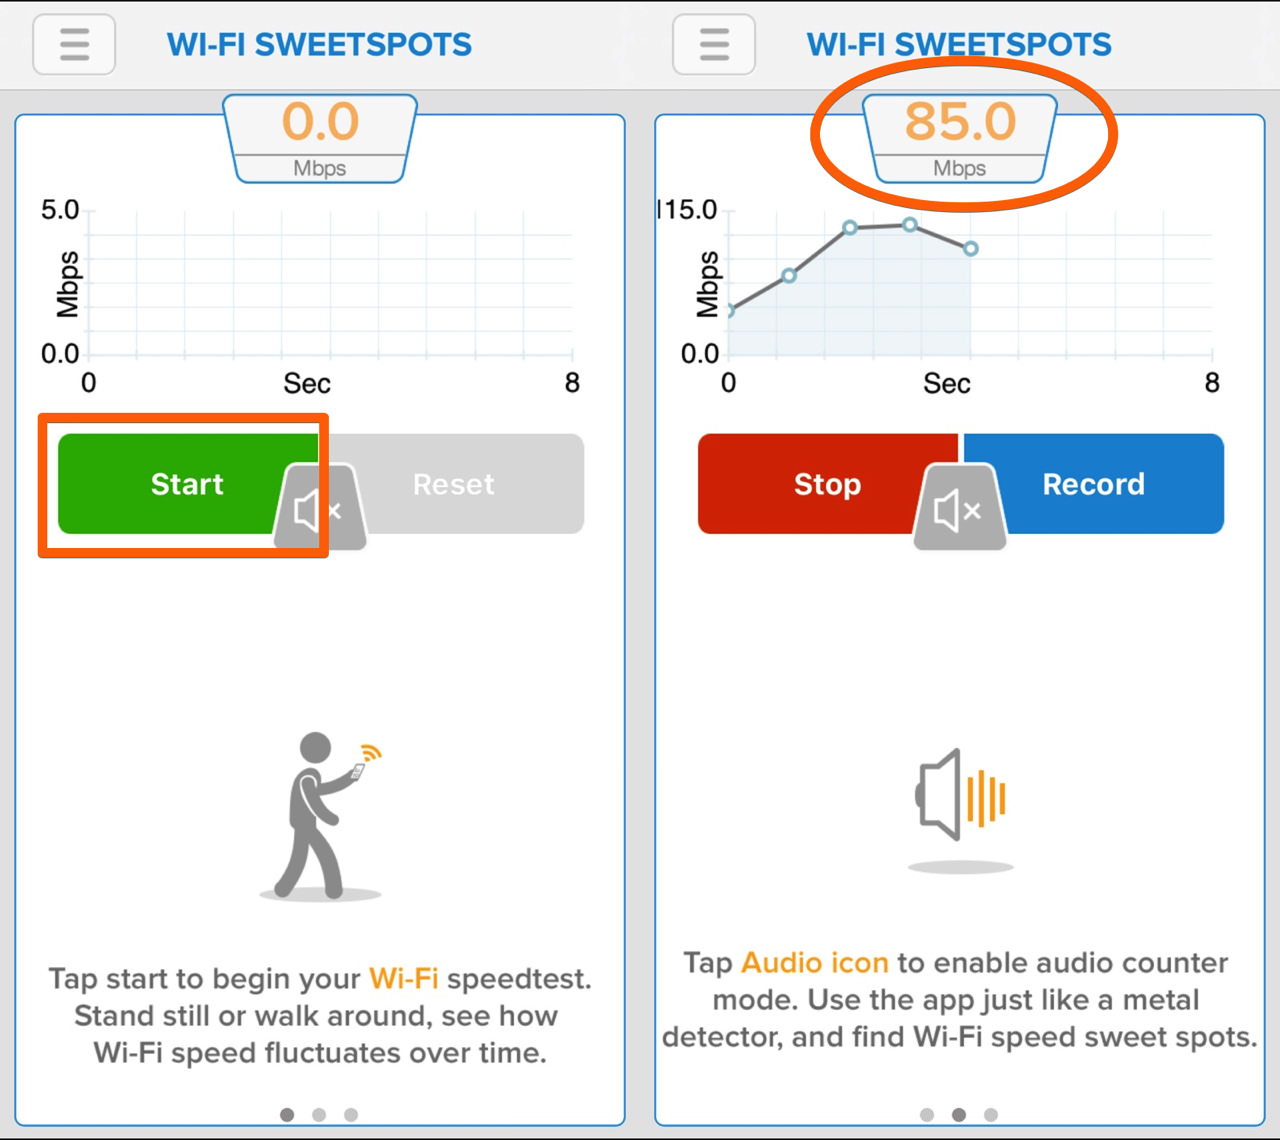 Wifi sweetspots1